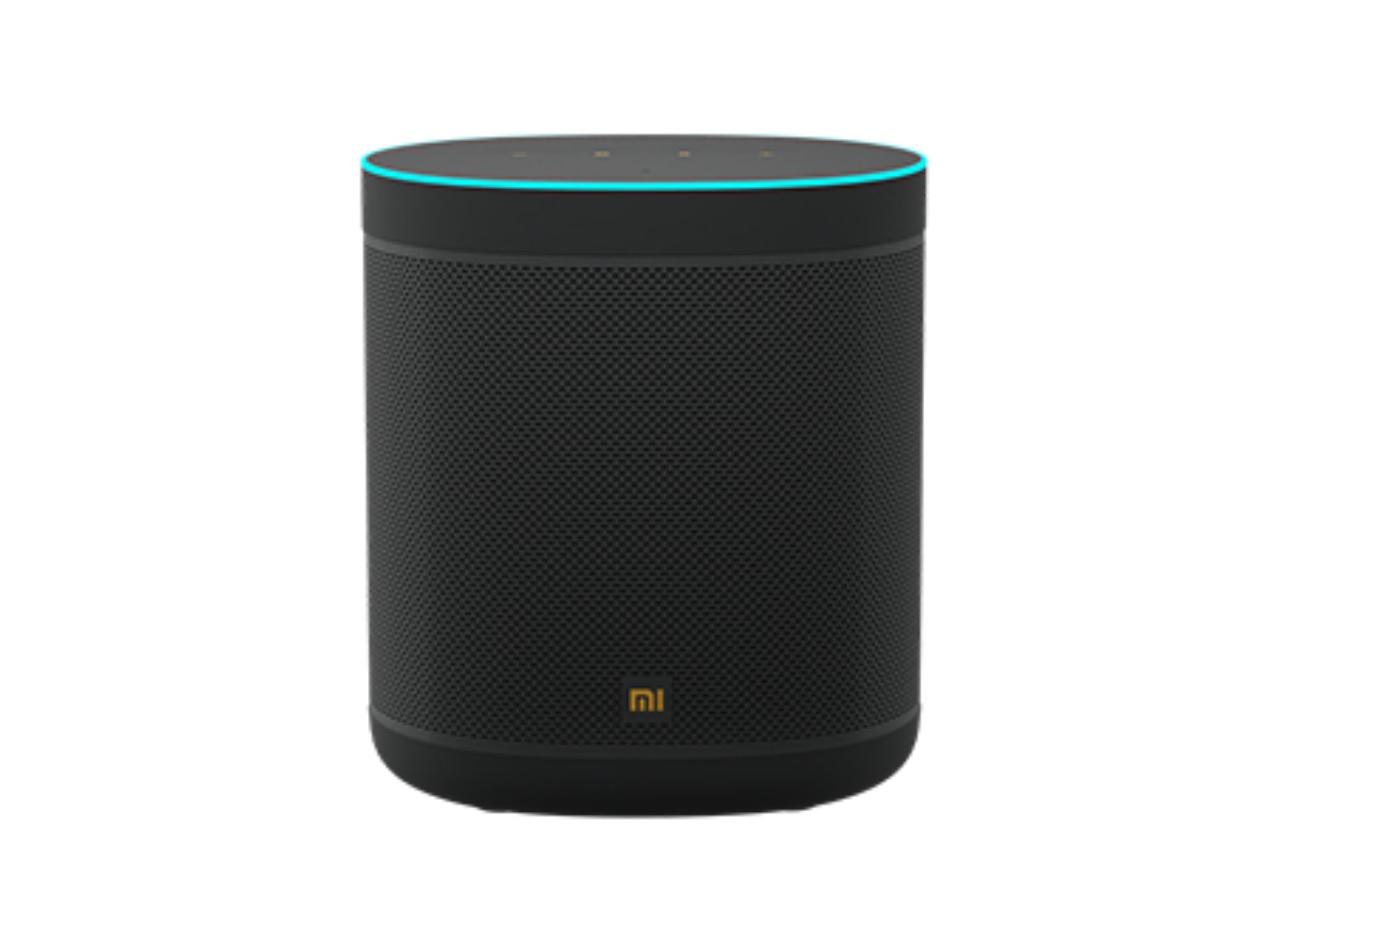 Mi Smart Speaker de Xiaomi